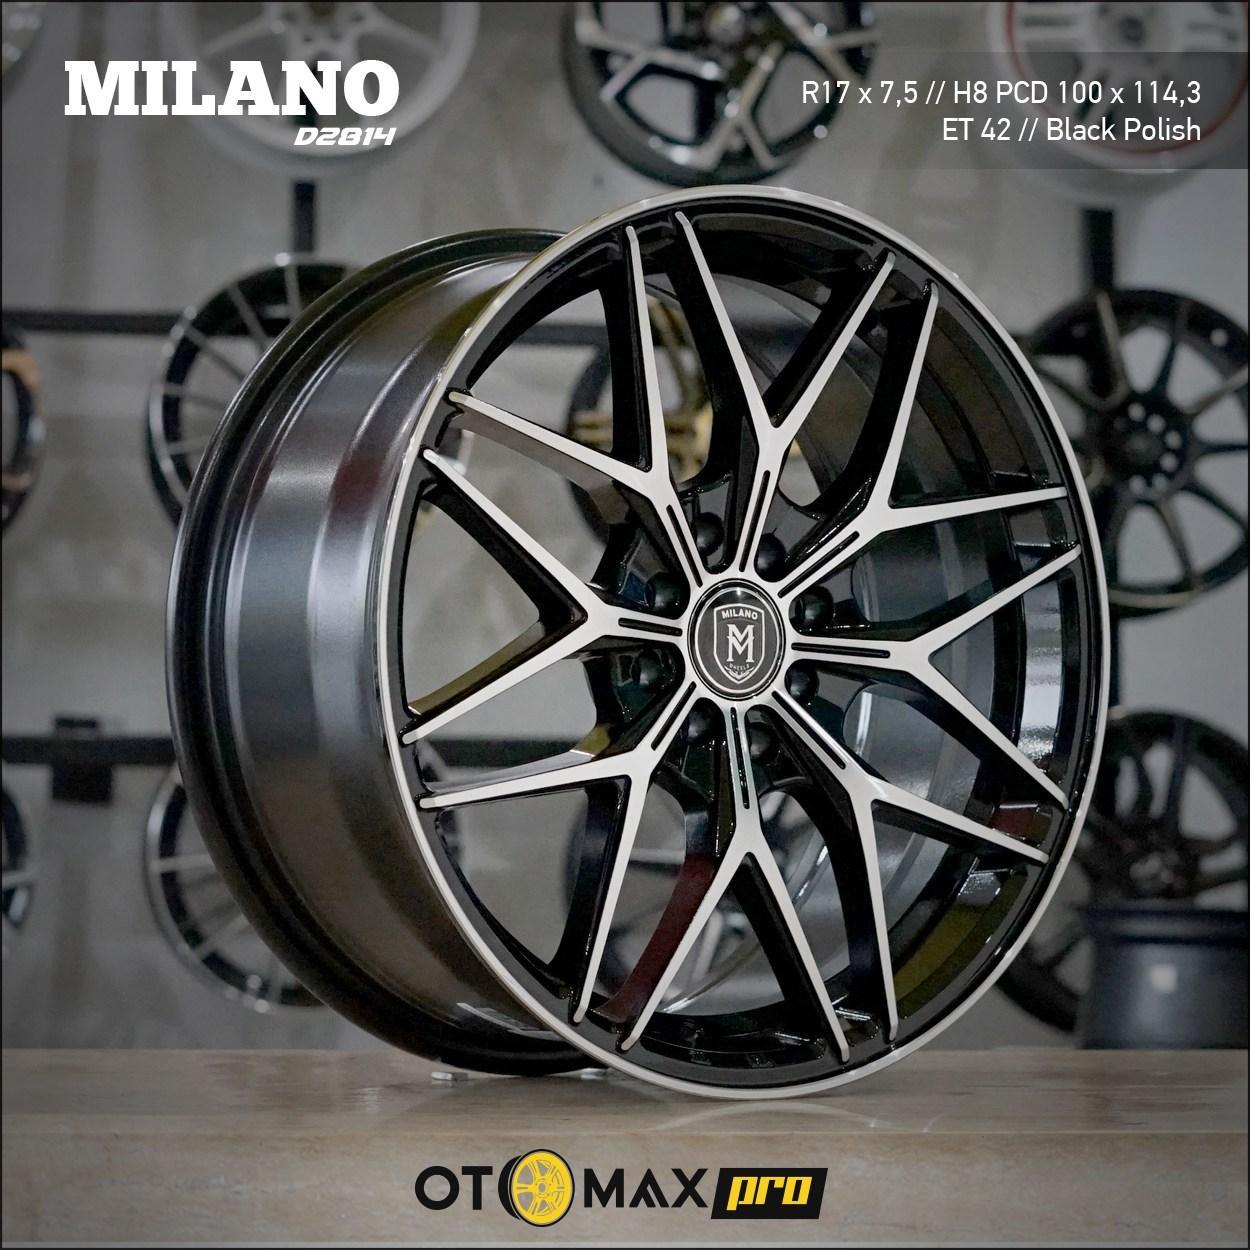 Velg Mobil Milano D2814 Ring 17 Black Polish